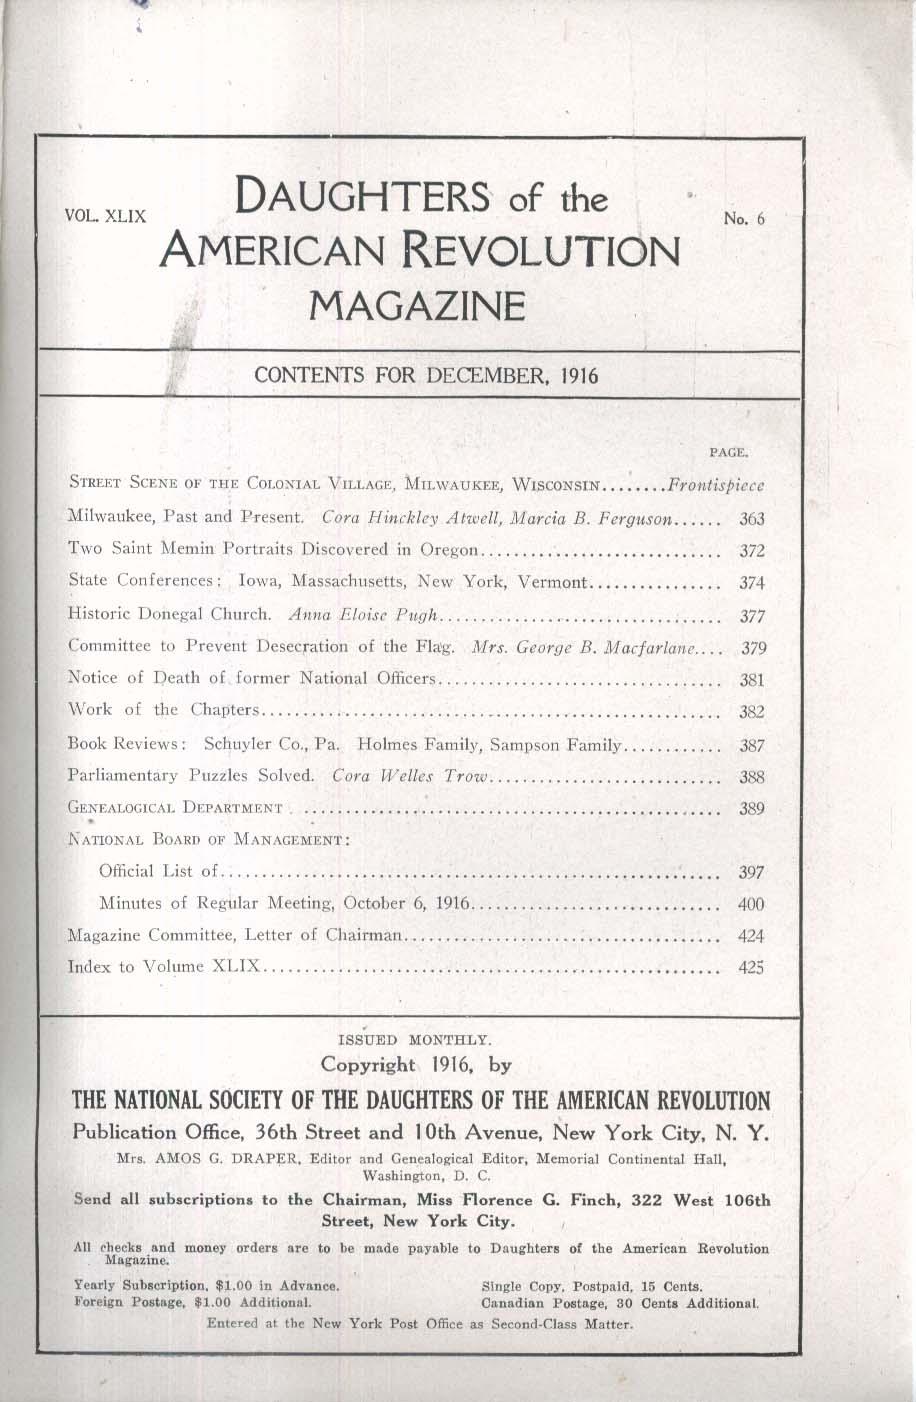 DAUGHTERS of the AMERICAN REVOLUTION Saint Memin Schuyler Holmes Sampson 12 1916